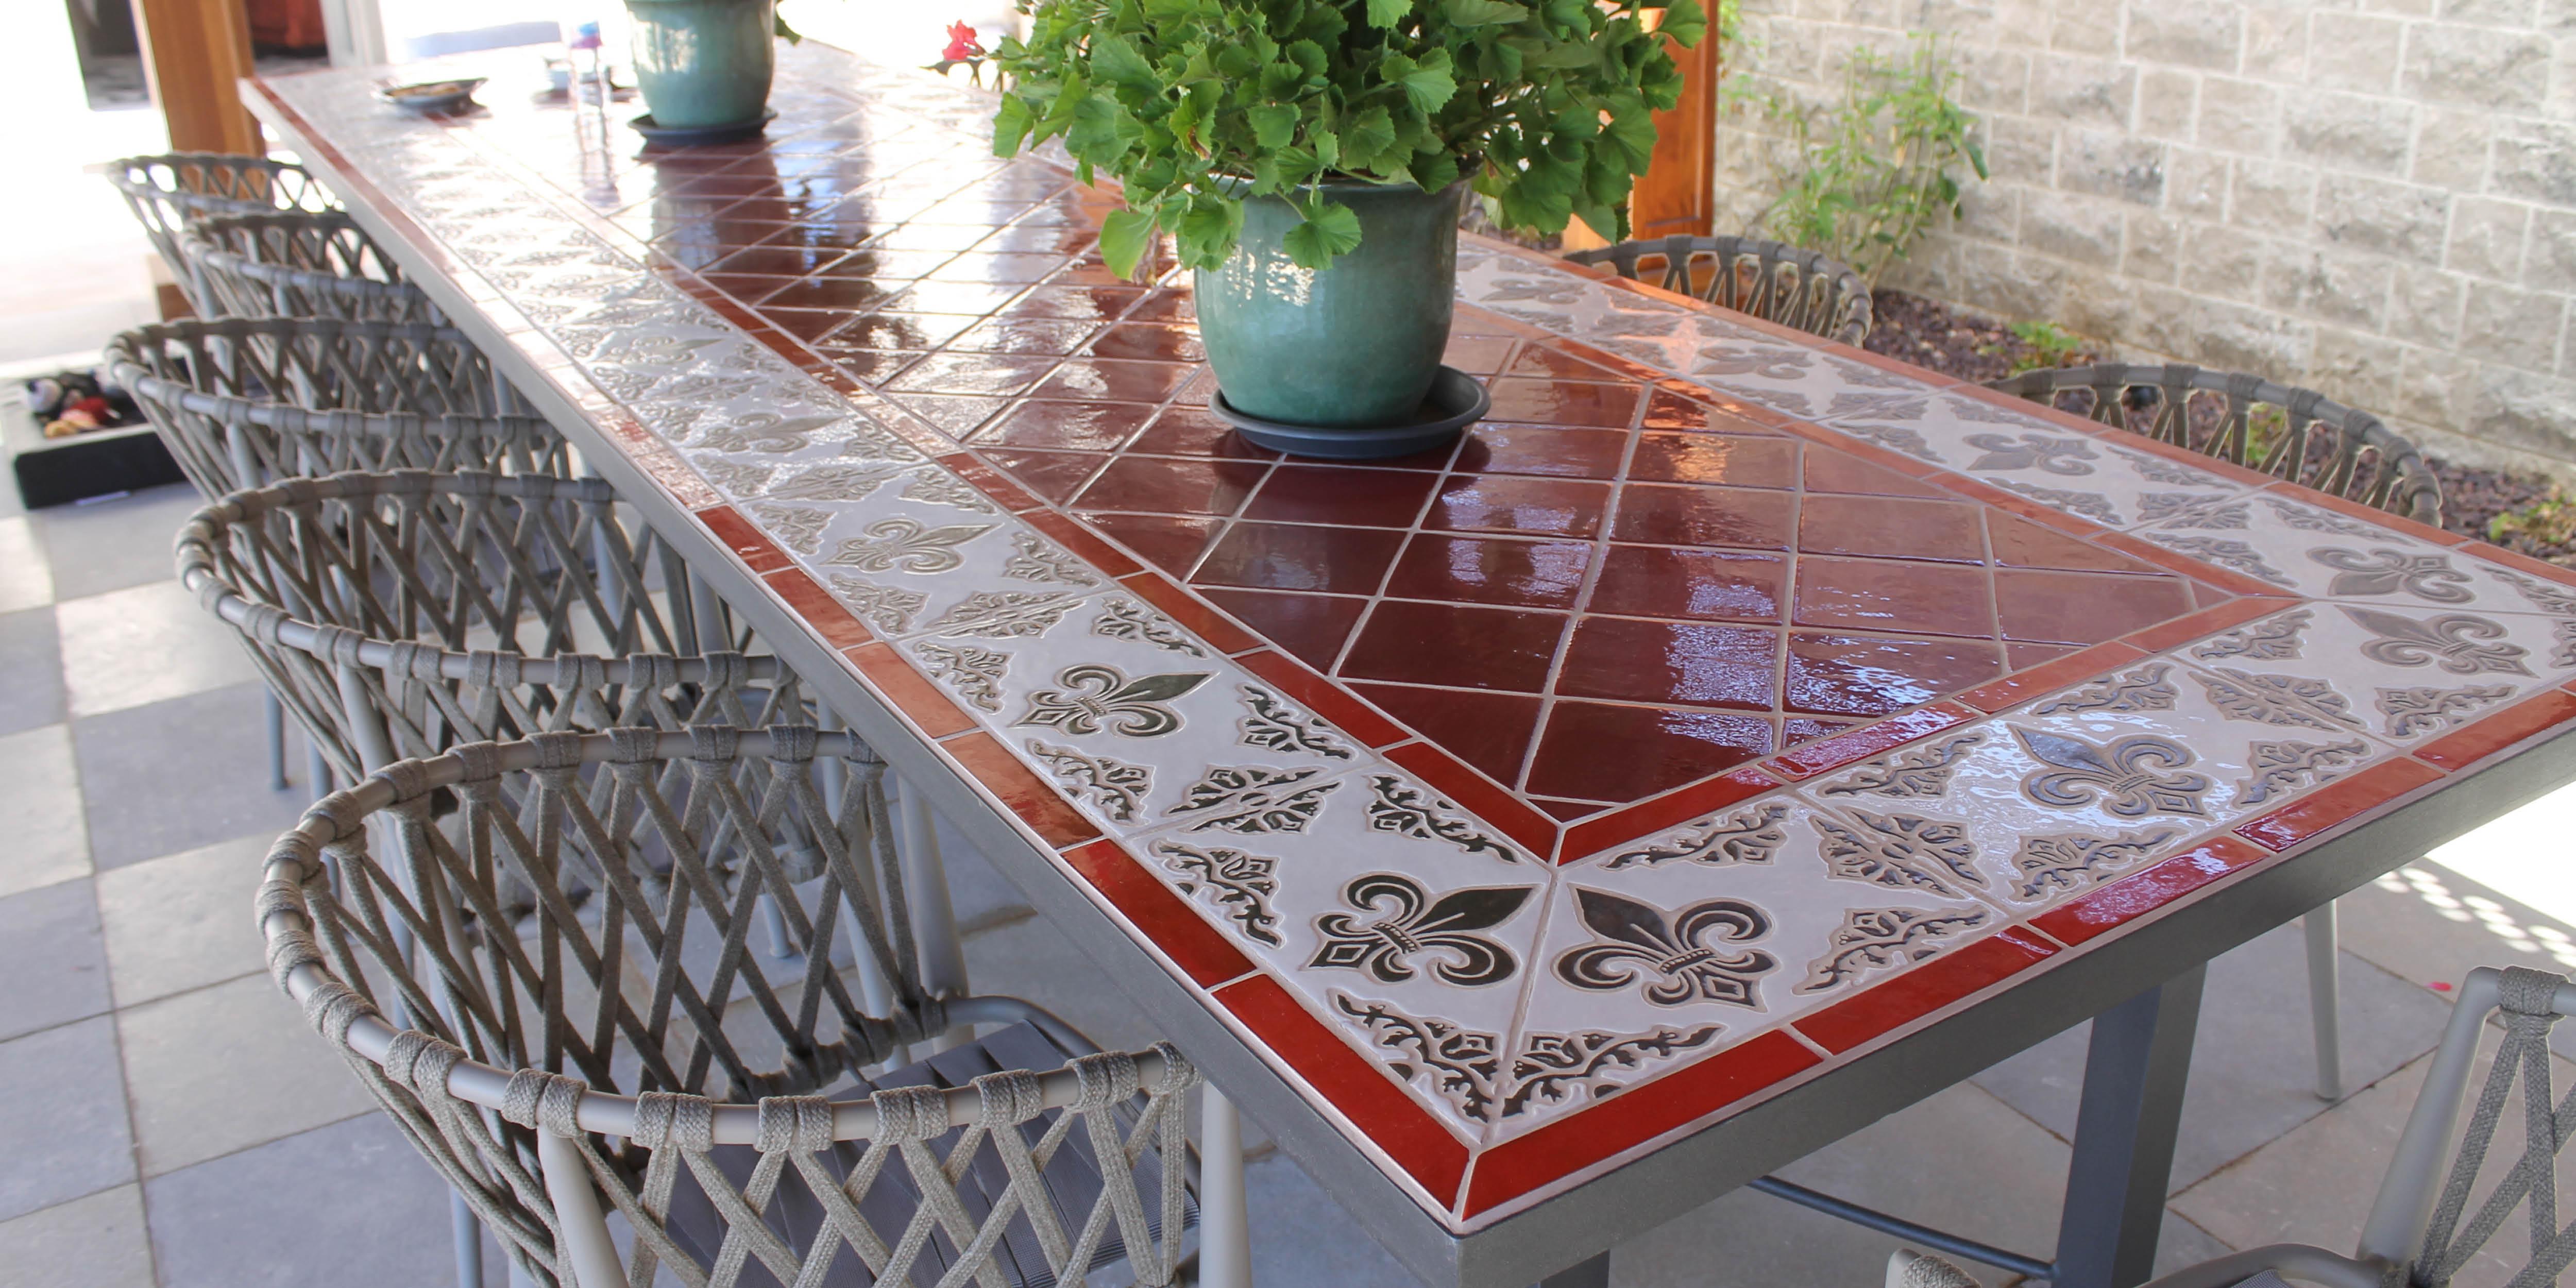 Exclusive Ceramic Tiles, Wall Art, Ceramic Murals, House ...